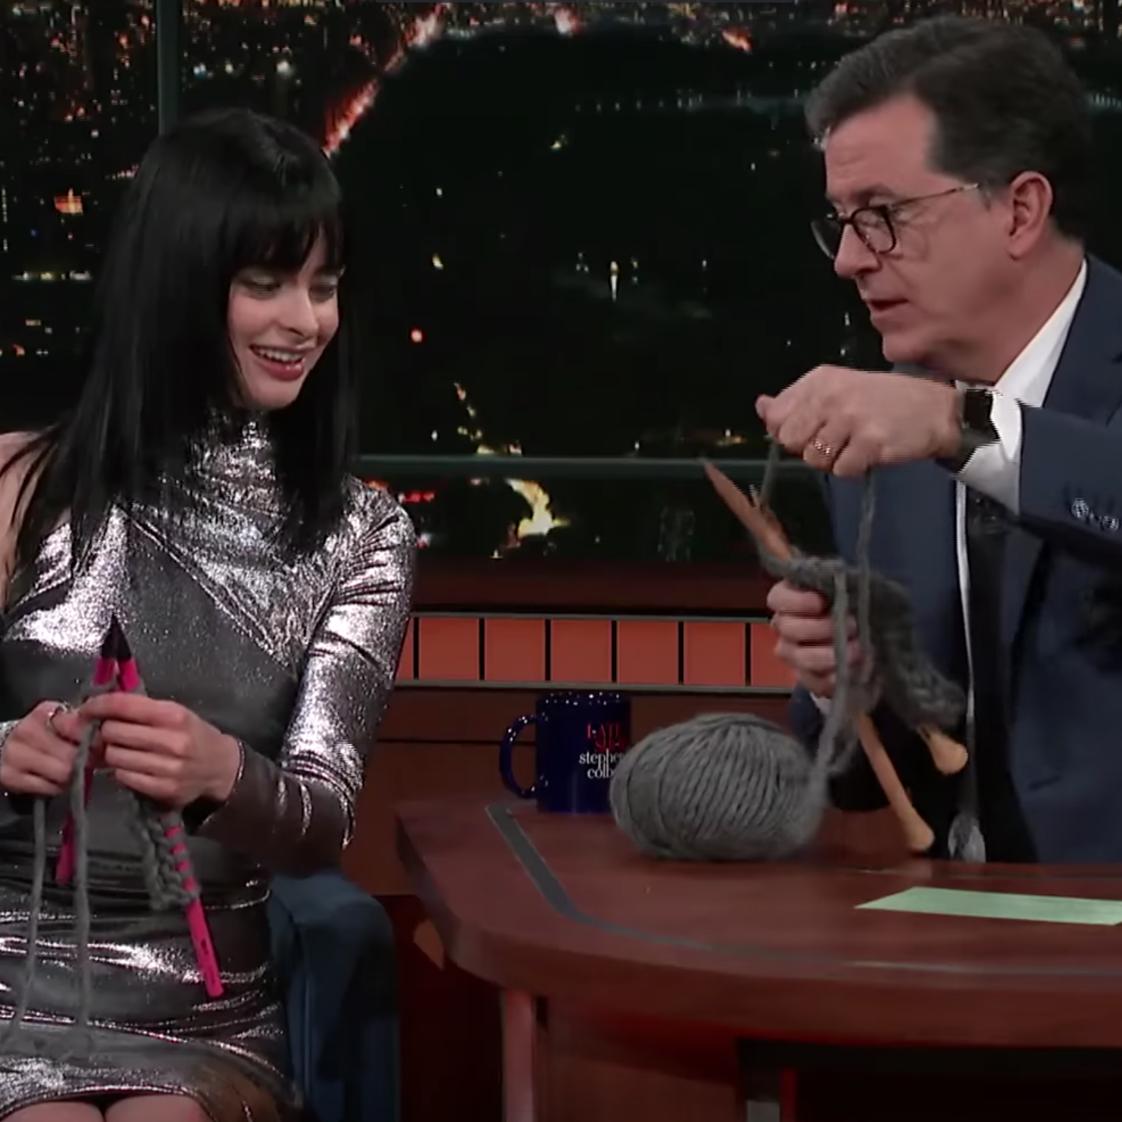 Krysten Ritter taught Stephen Colbert how to knit.